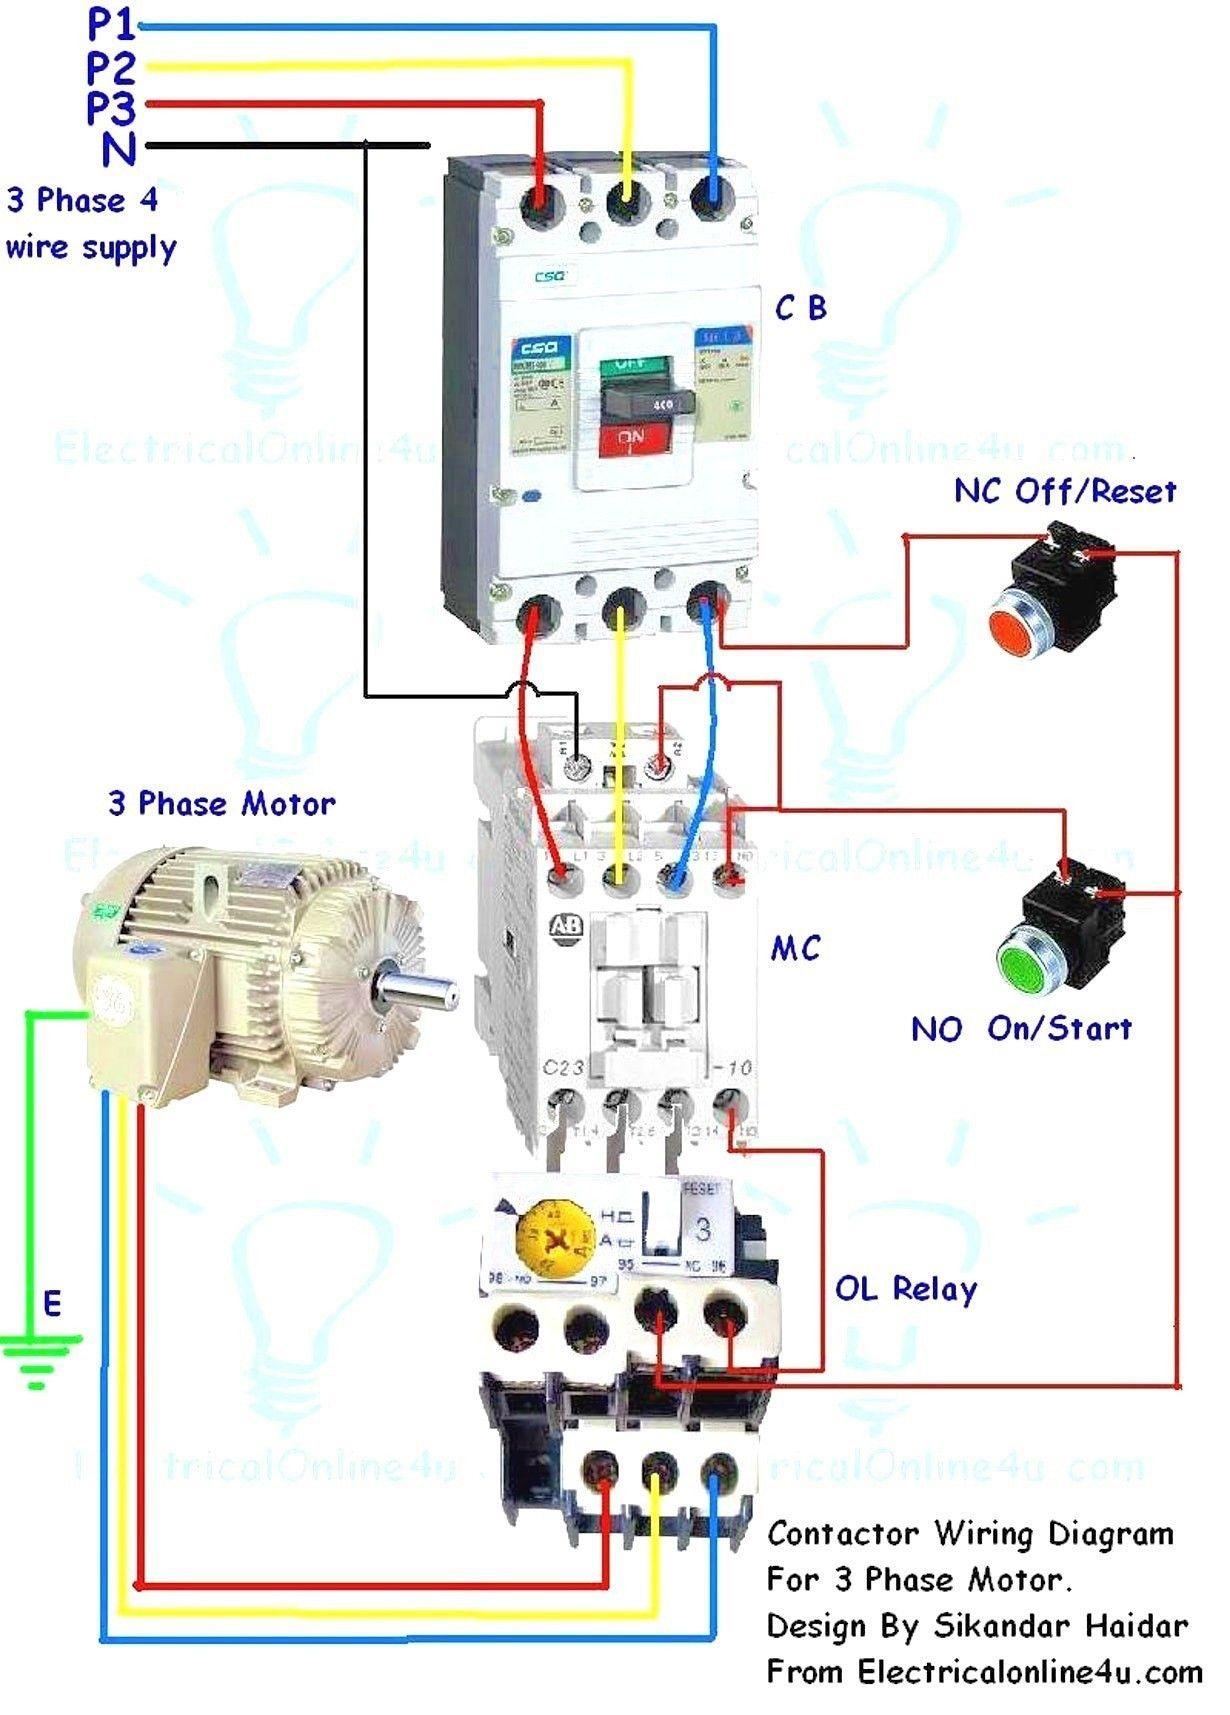 240 volt contactor wiring diagram free download wiring diagram view 3 phase wire wiring diagram free [ 1230 x 1715 Pixel ]